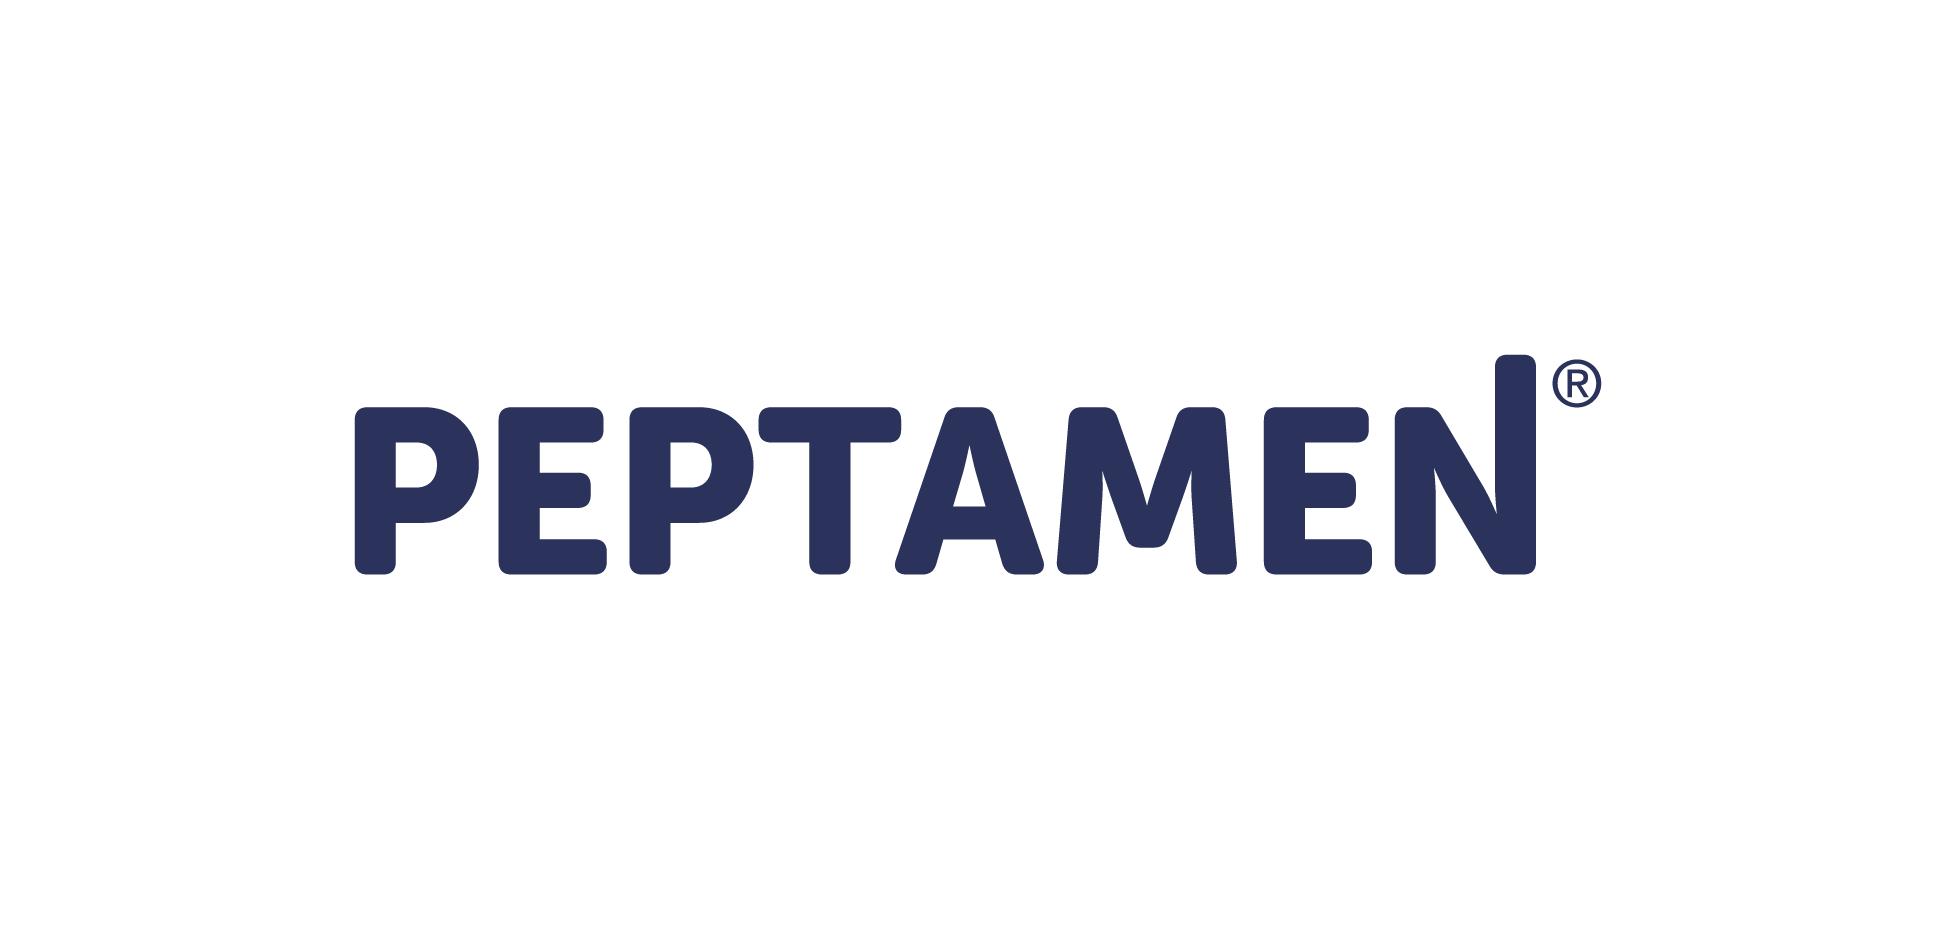 PEPTAMEN